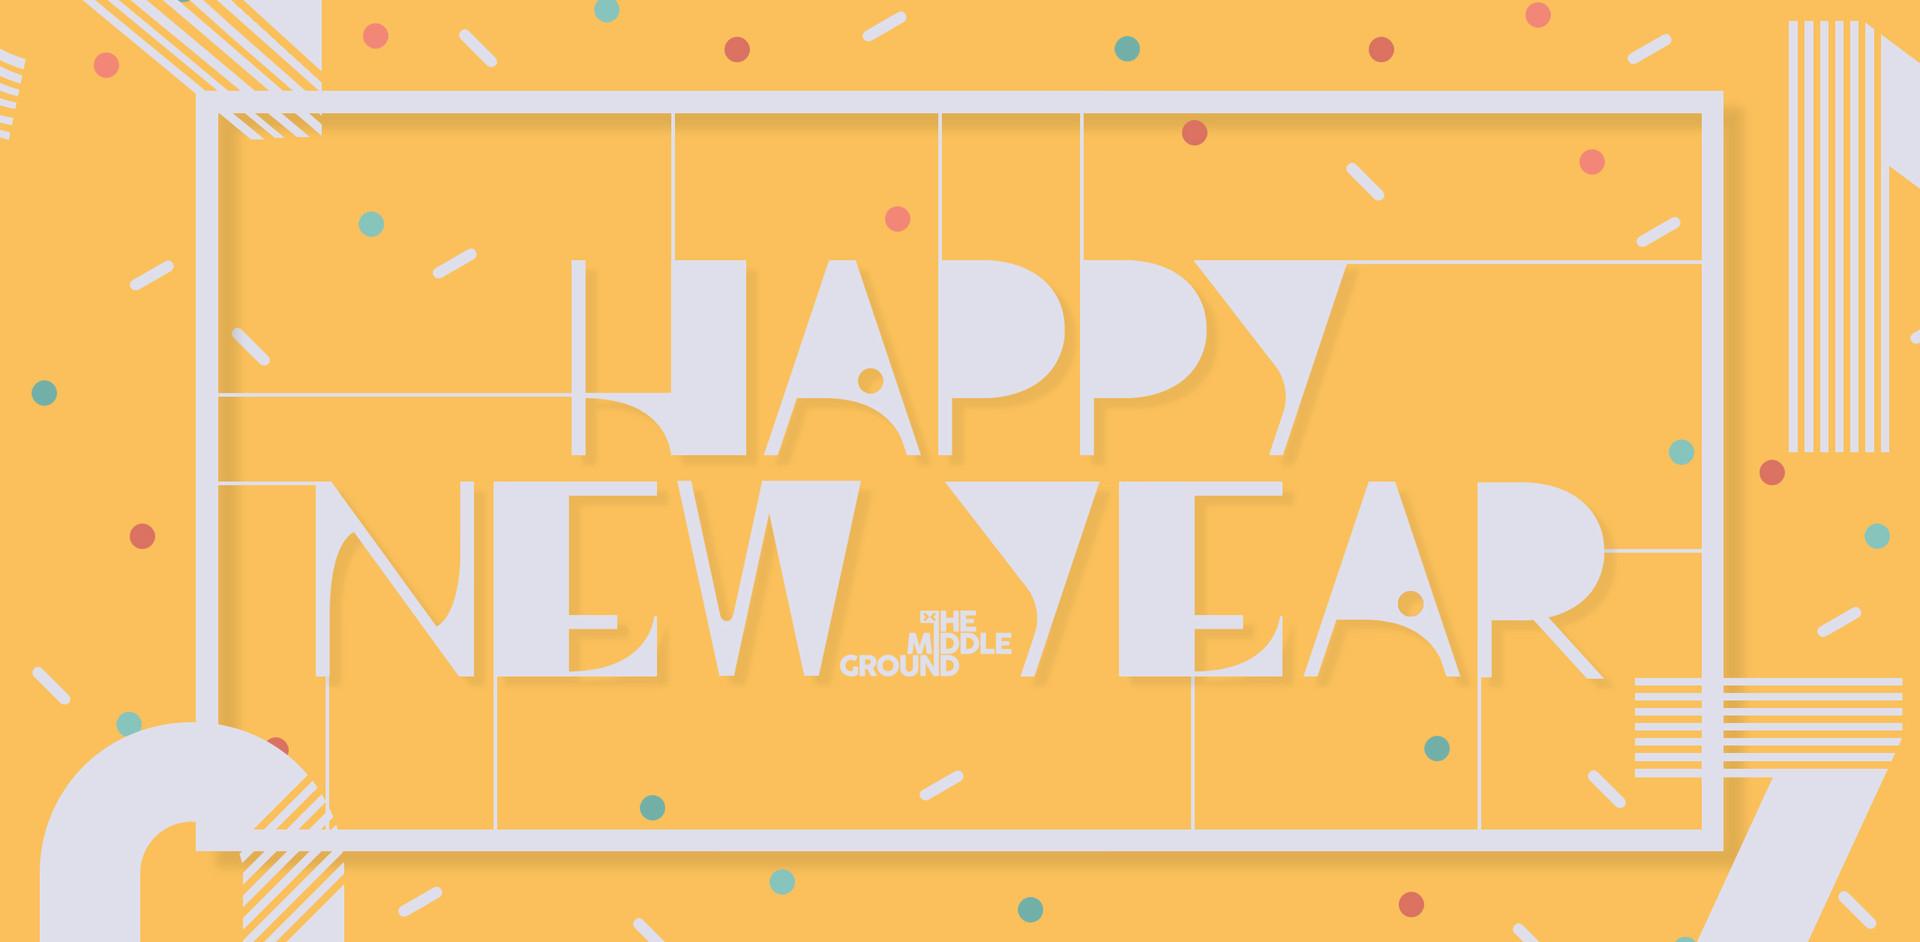 TMG FB Banner (Happy New Year 2017)